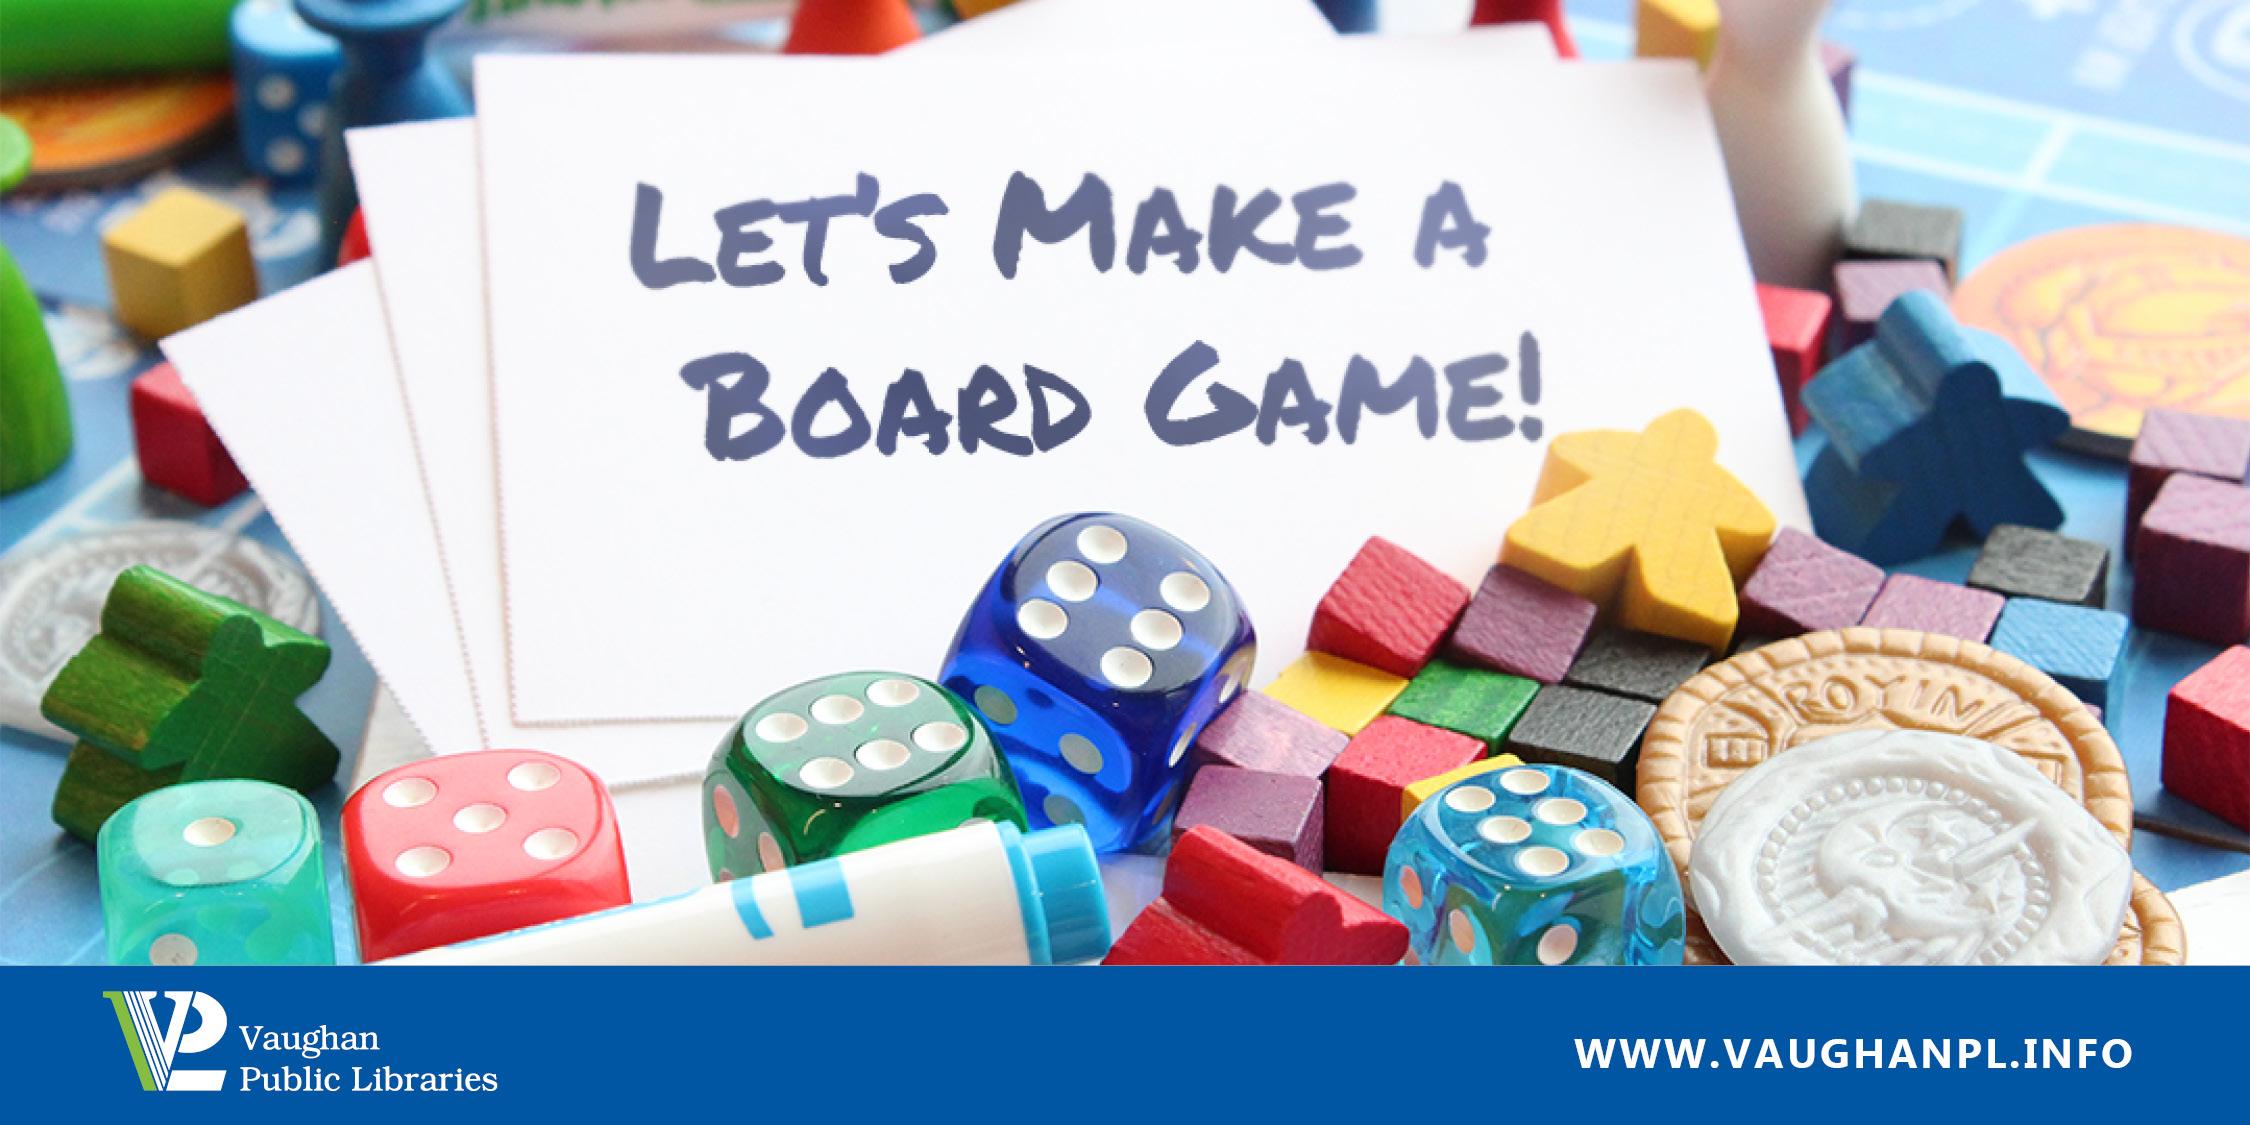 EB Lets Make A Board Game.jpg